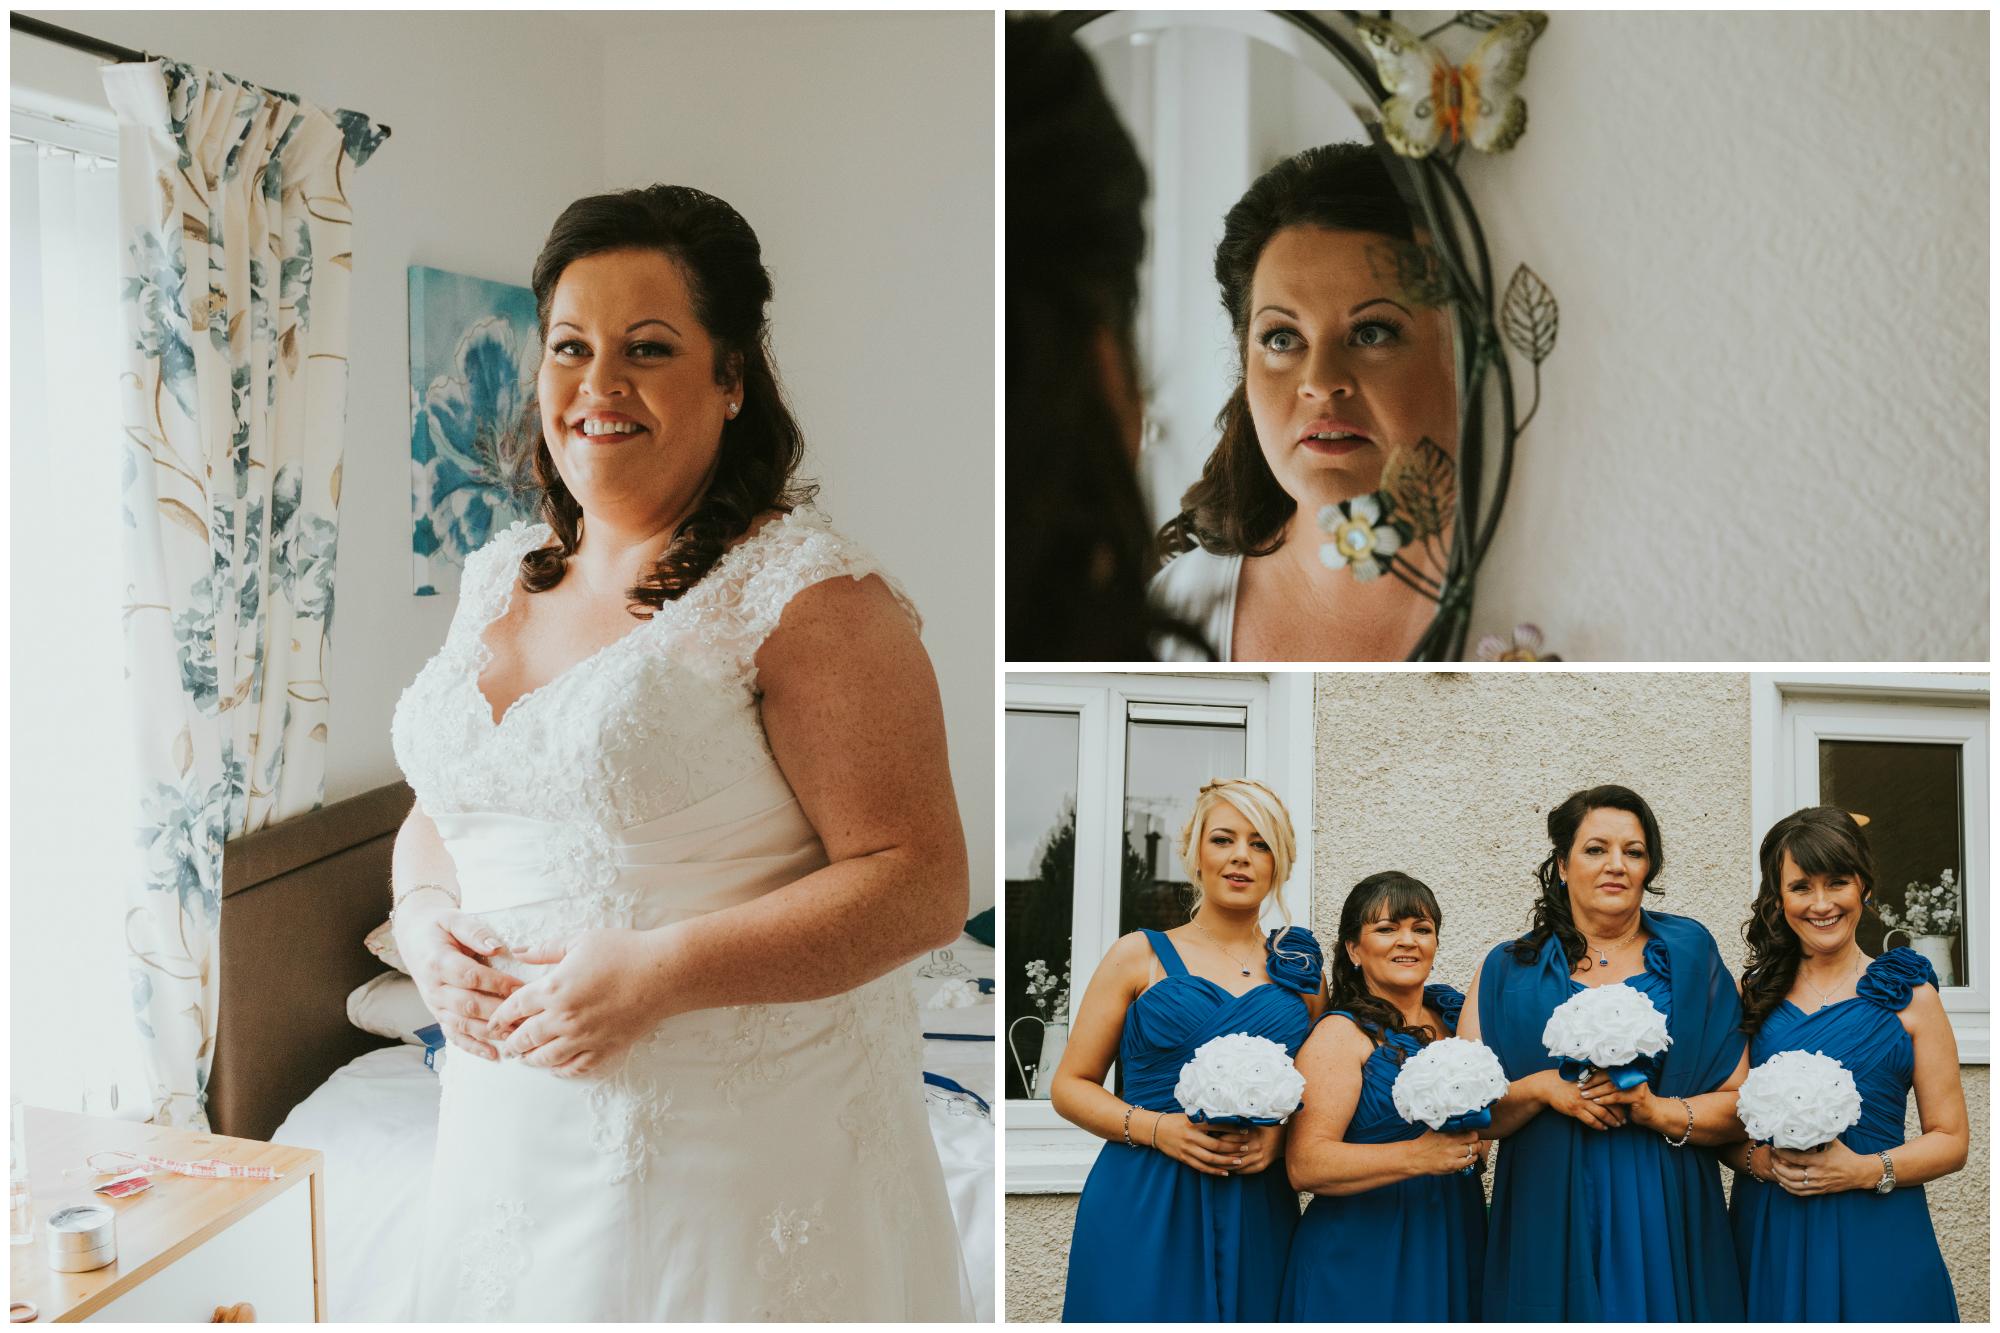 belfast wedding photographer pure photo n.i bride ready